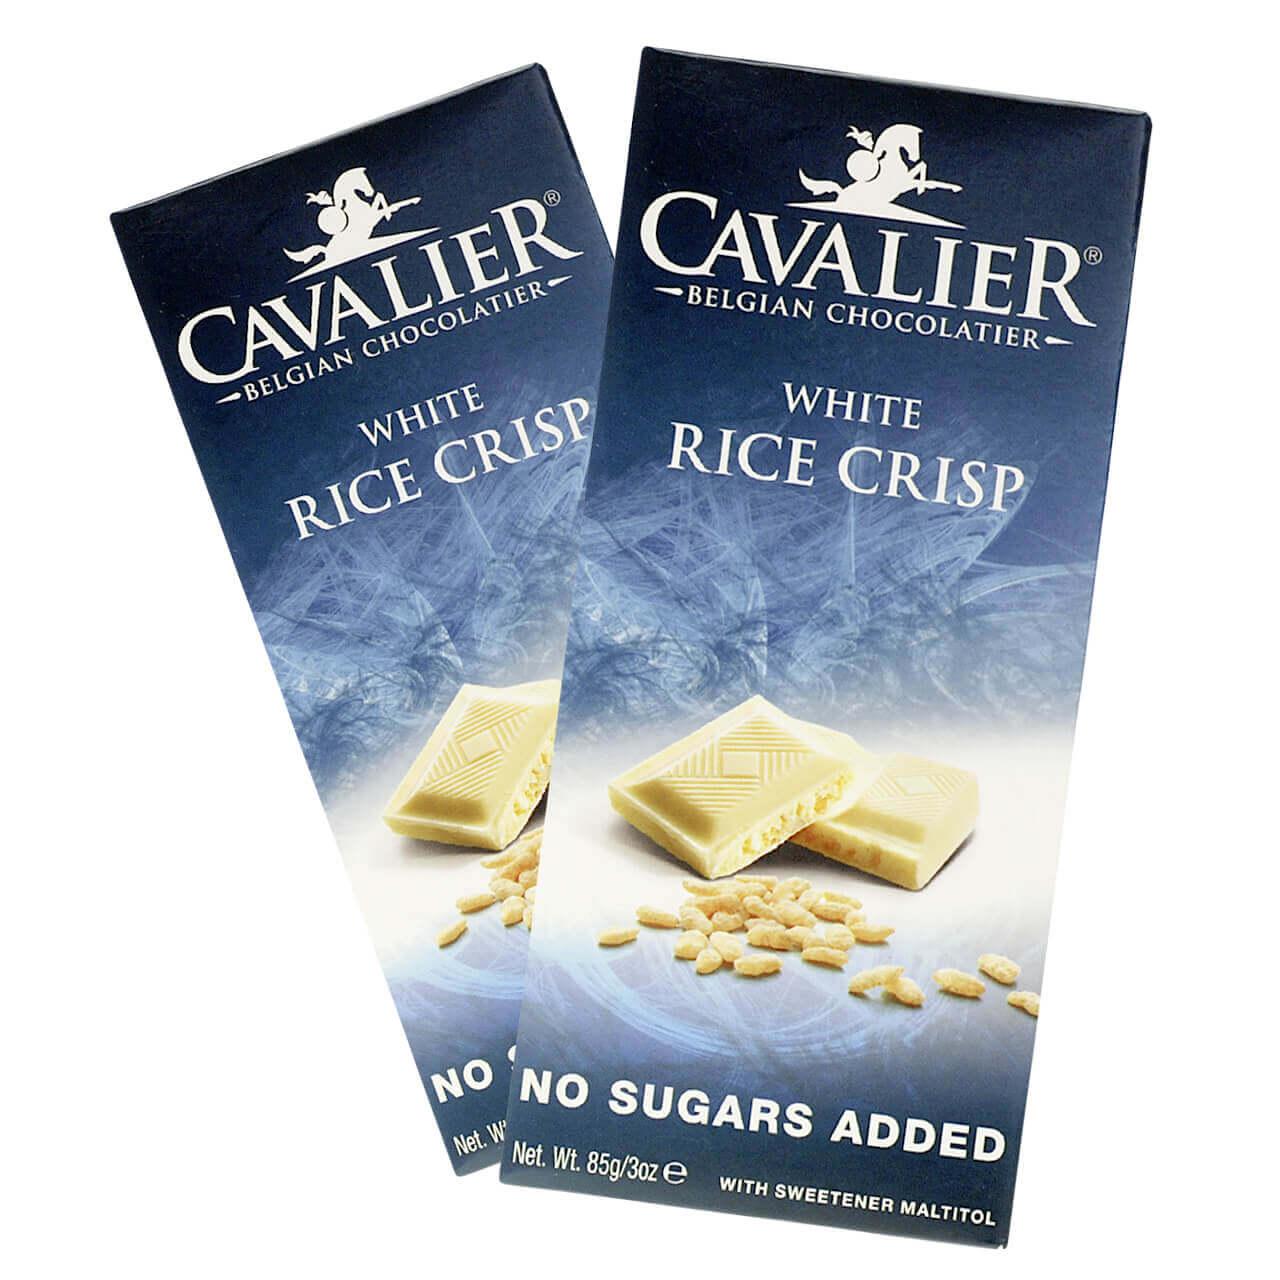 "Cavalier Schokolade ""Weiss Rice Crisp"" 85 g Tafel, zuckerfreie Schokolade. Schokolade ohne Zucker kaufen, Süßigkeiten ohne Zucker. zuckerfreie Süßigkeiten kaufen."